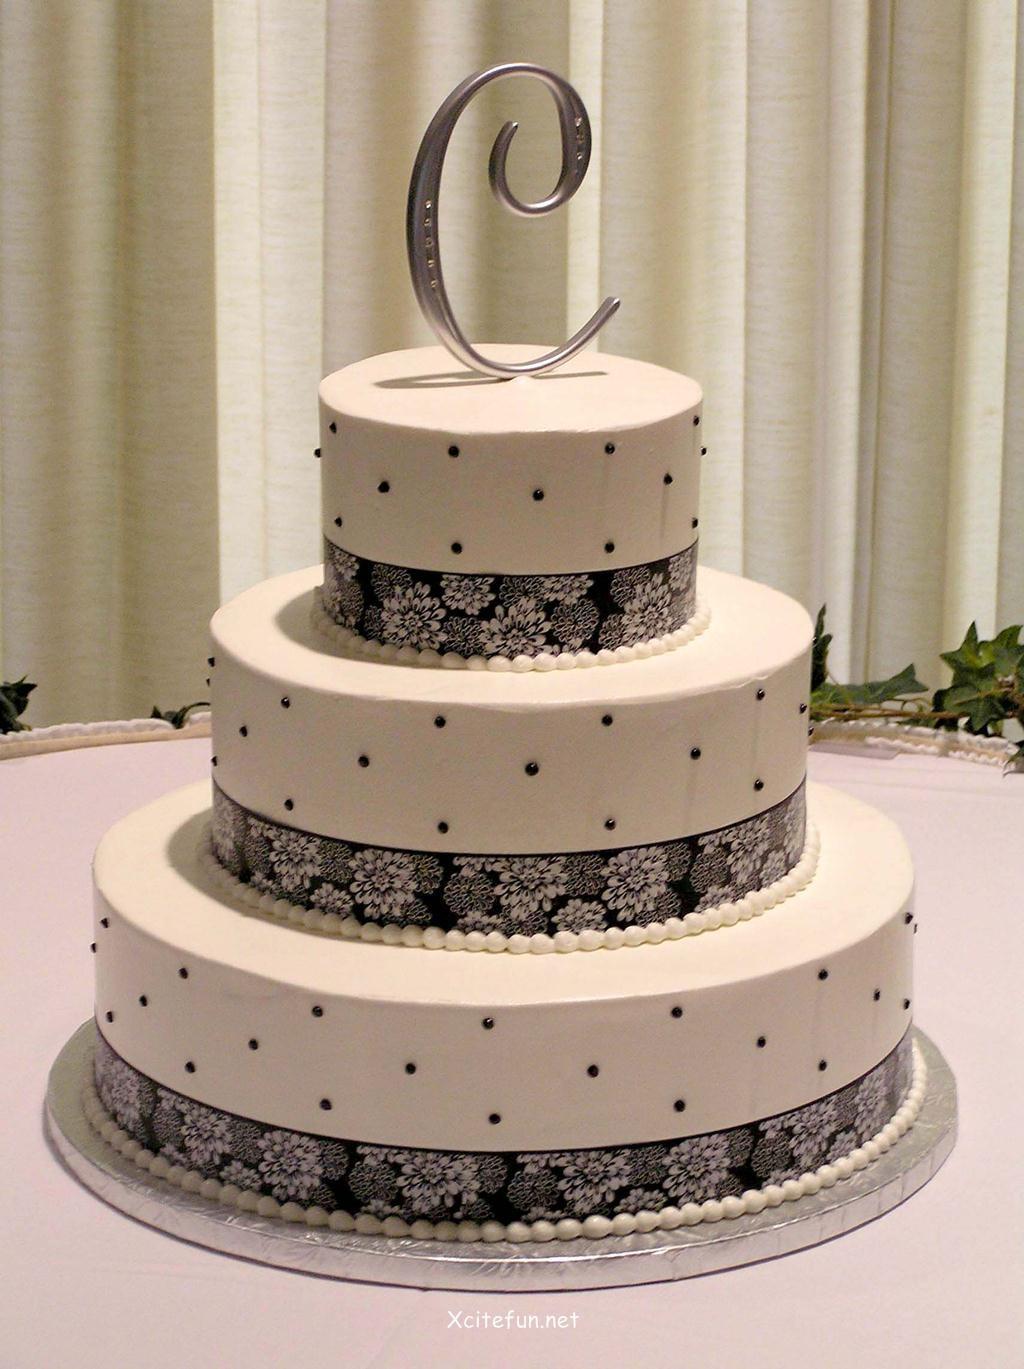 Wedding Cakes Decorated  Wedding Cakes Decorating Ideas XciteFun